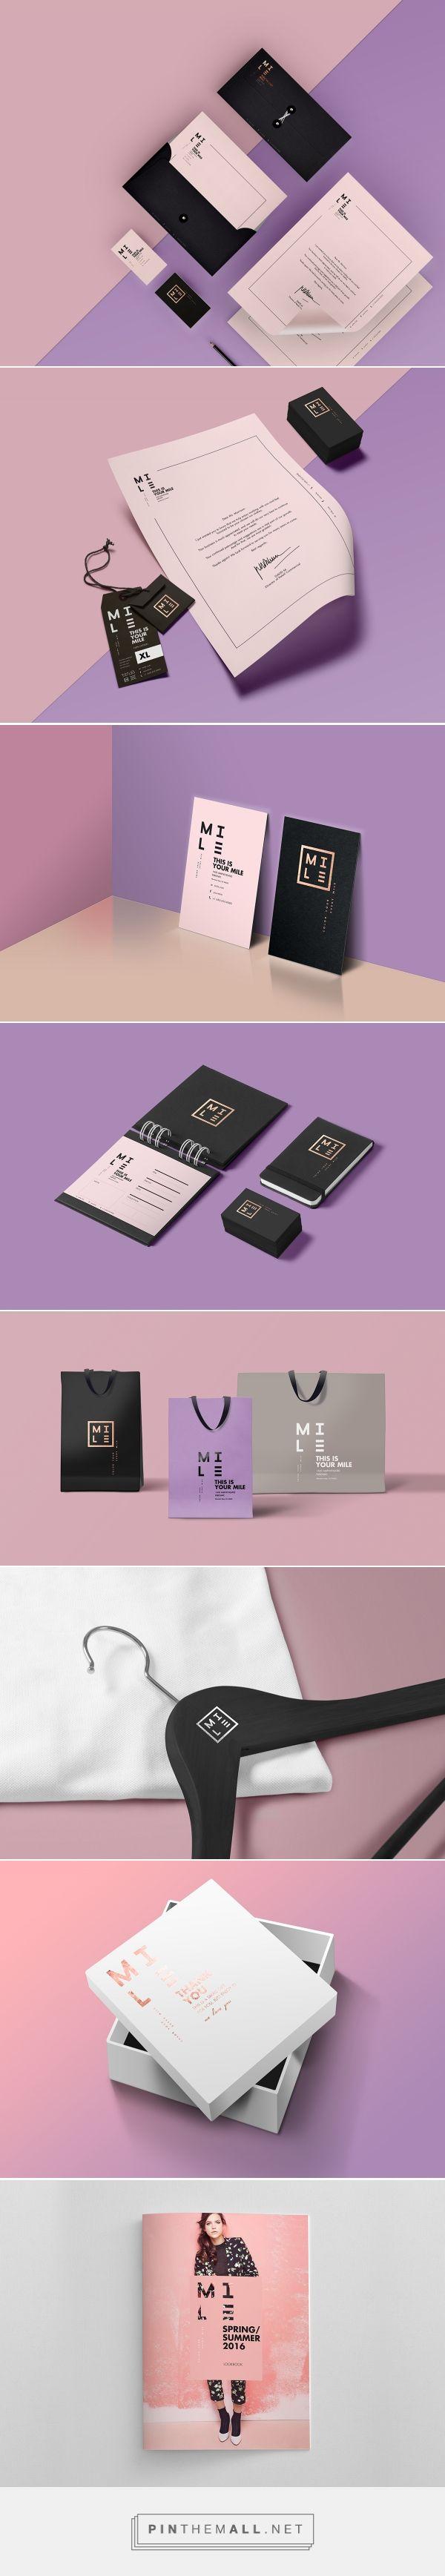 MILE -  Fashion Brand Identity